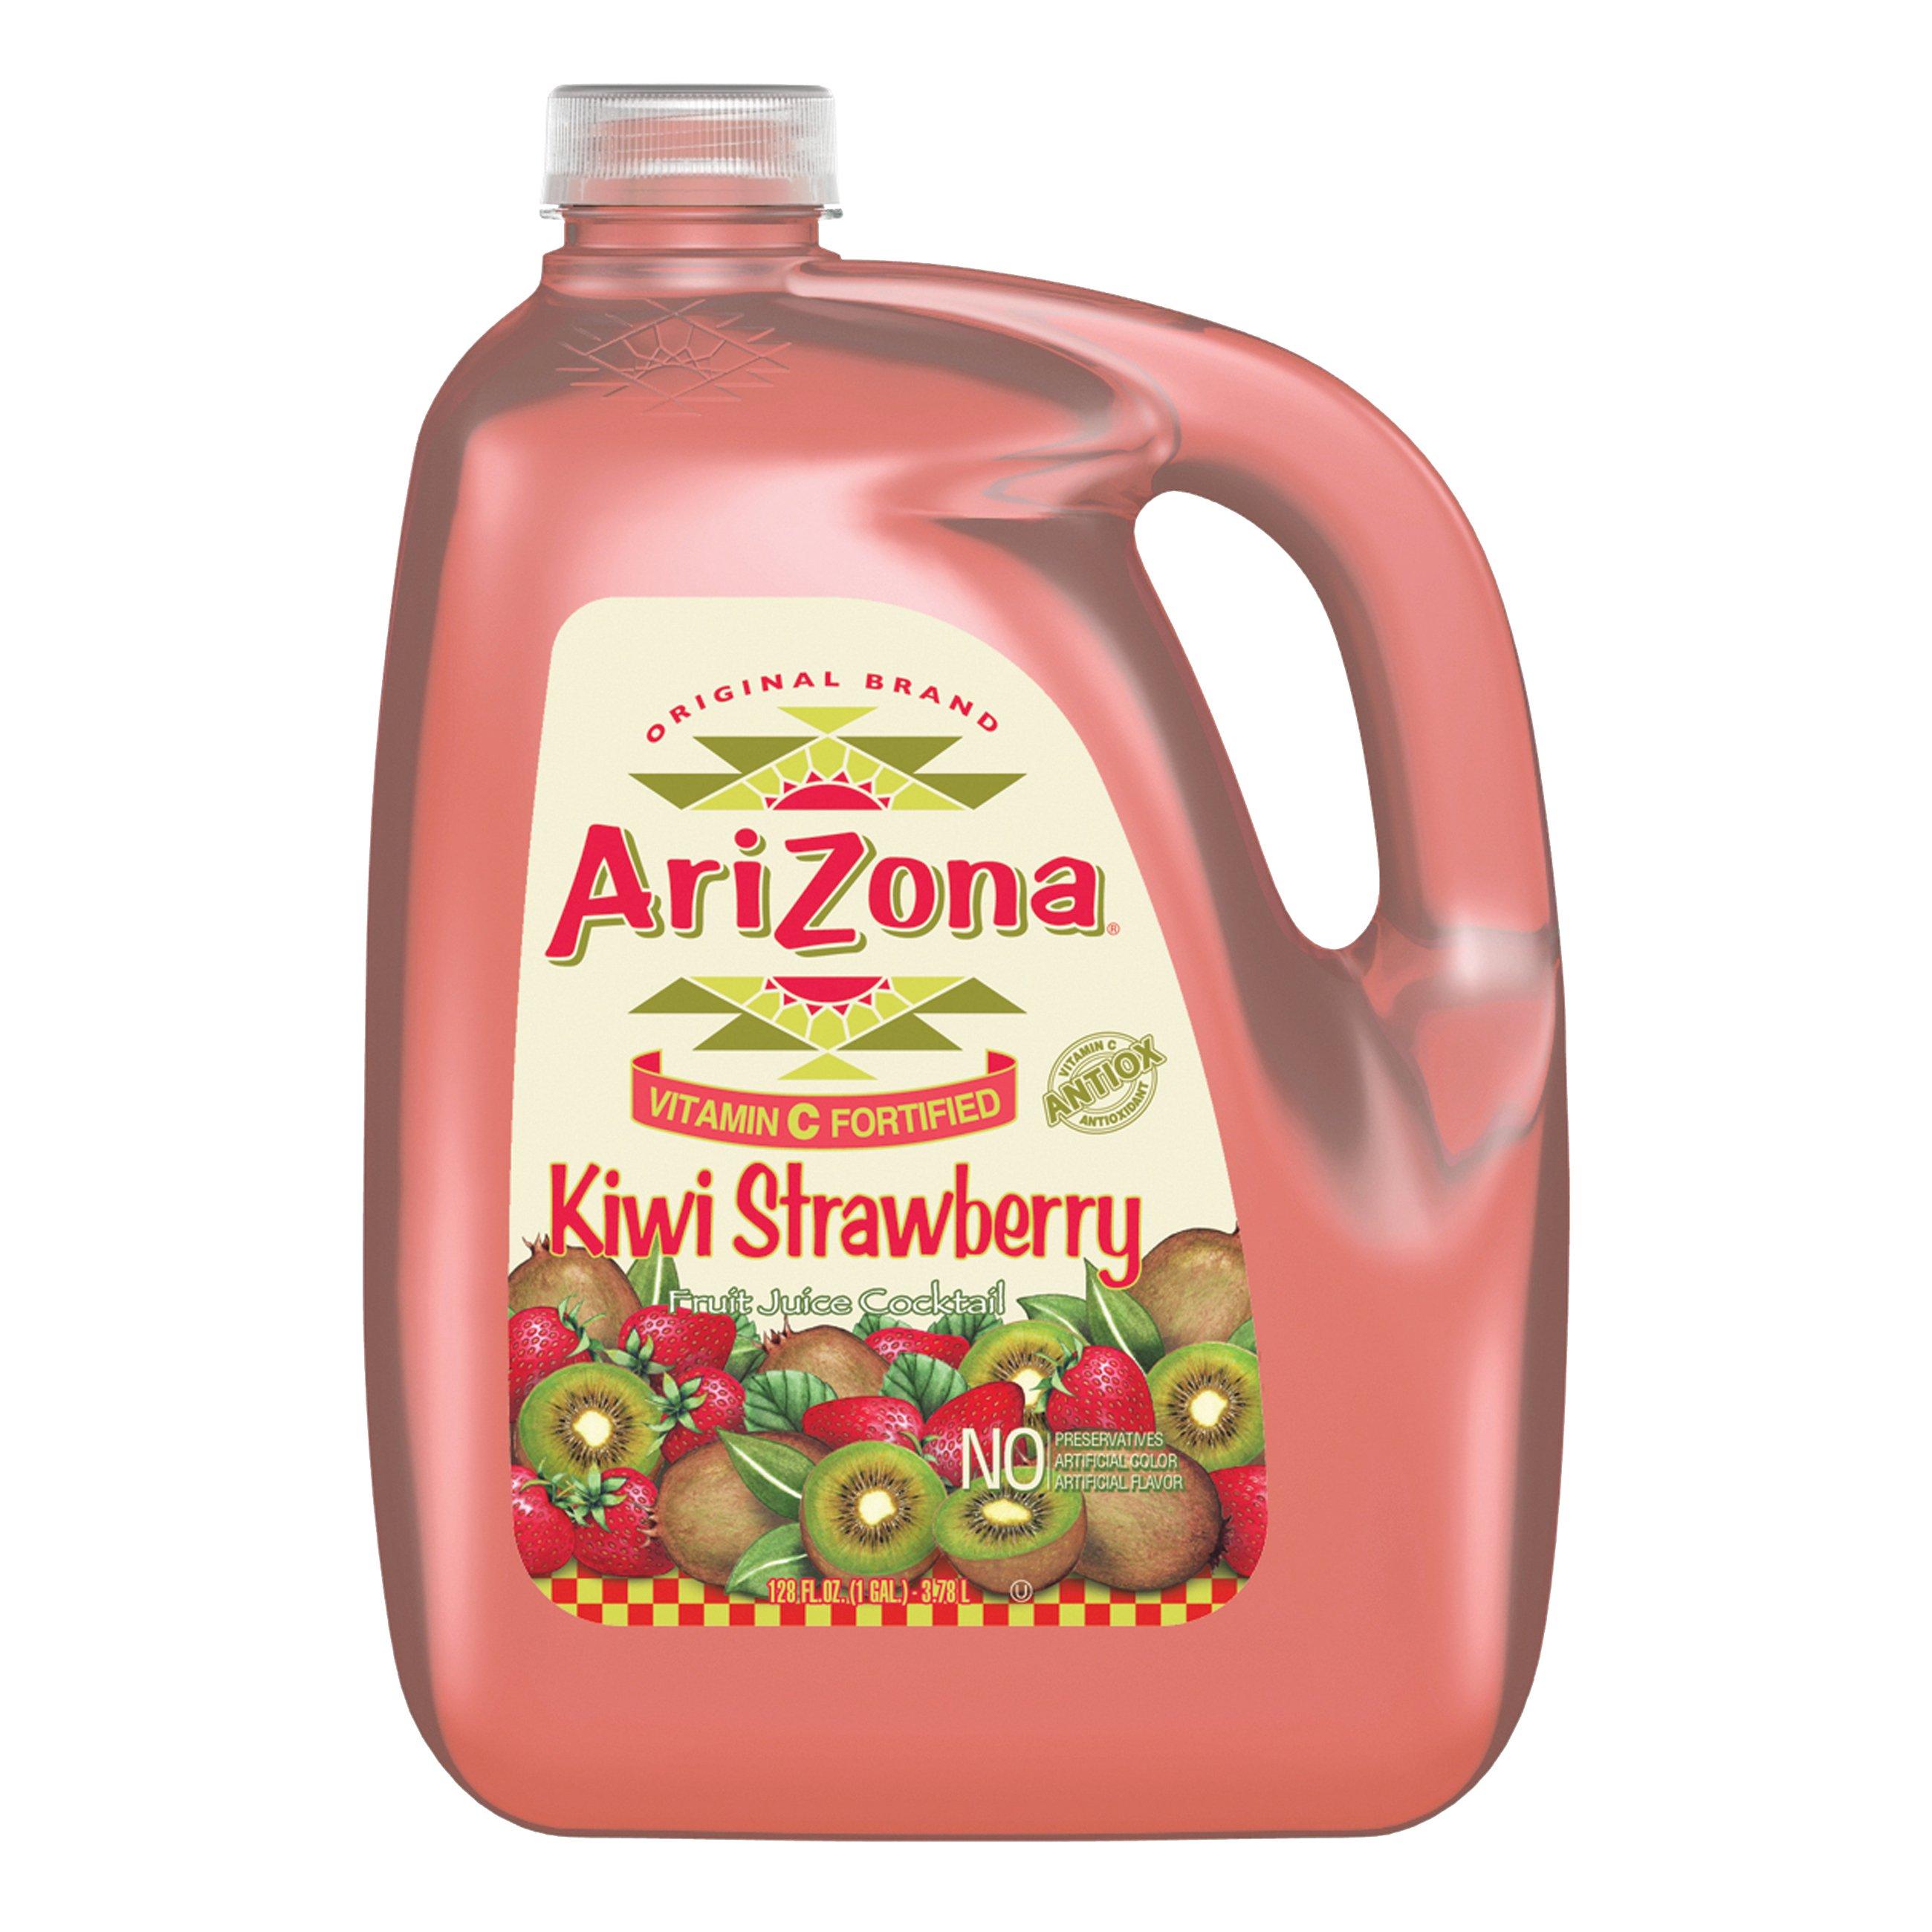 Arizona Kiwi Strawberry Fruit Juice Cocktail Shop Juice At H E B,Black And White Cats Breed